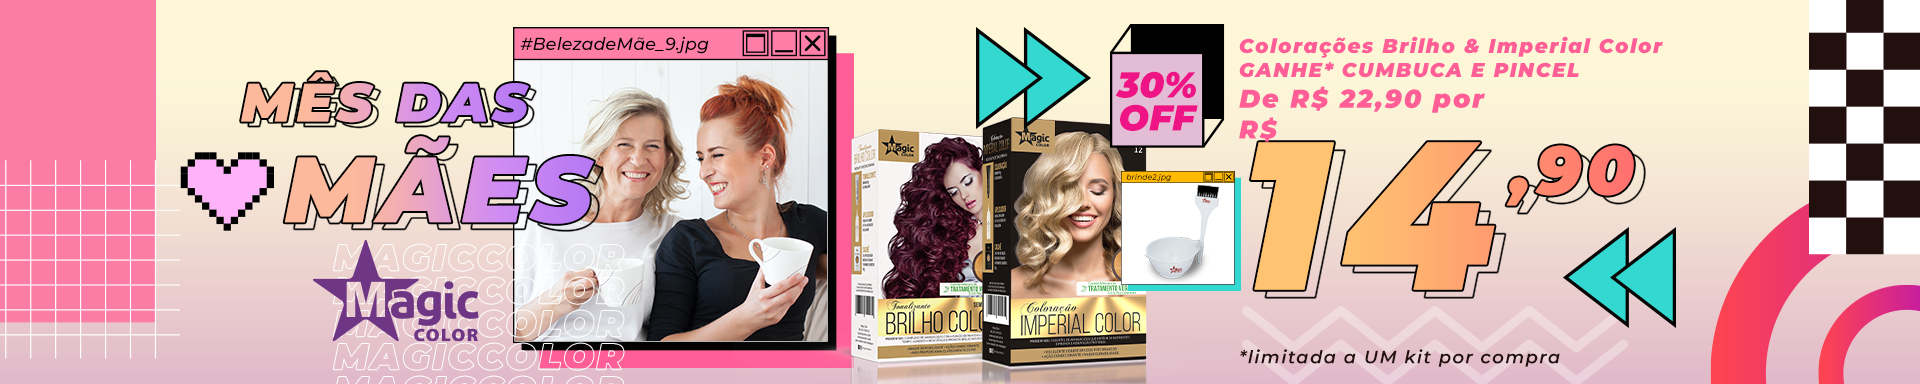 Banner- Exclusive Blond e Magic